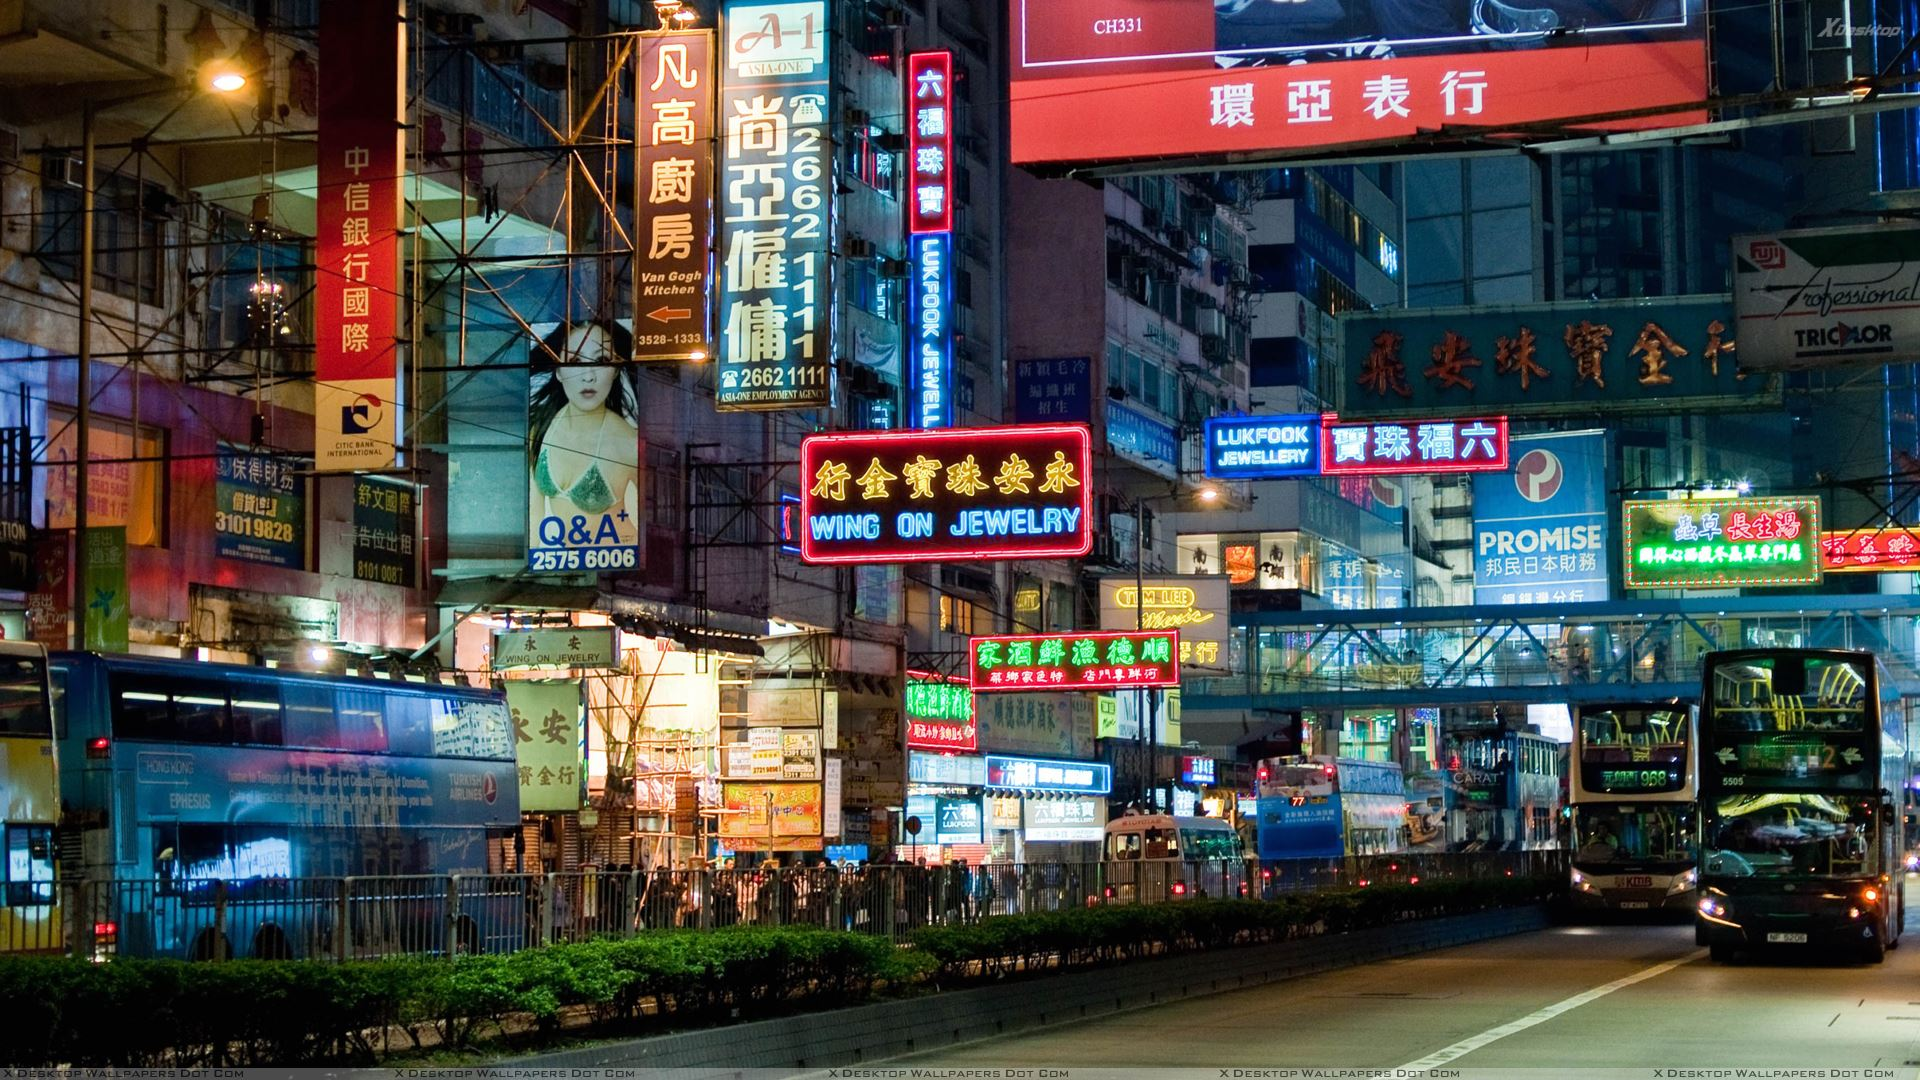 China Market Scene At Night Wallpaper 1920x1080